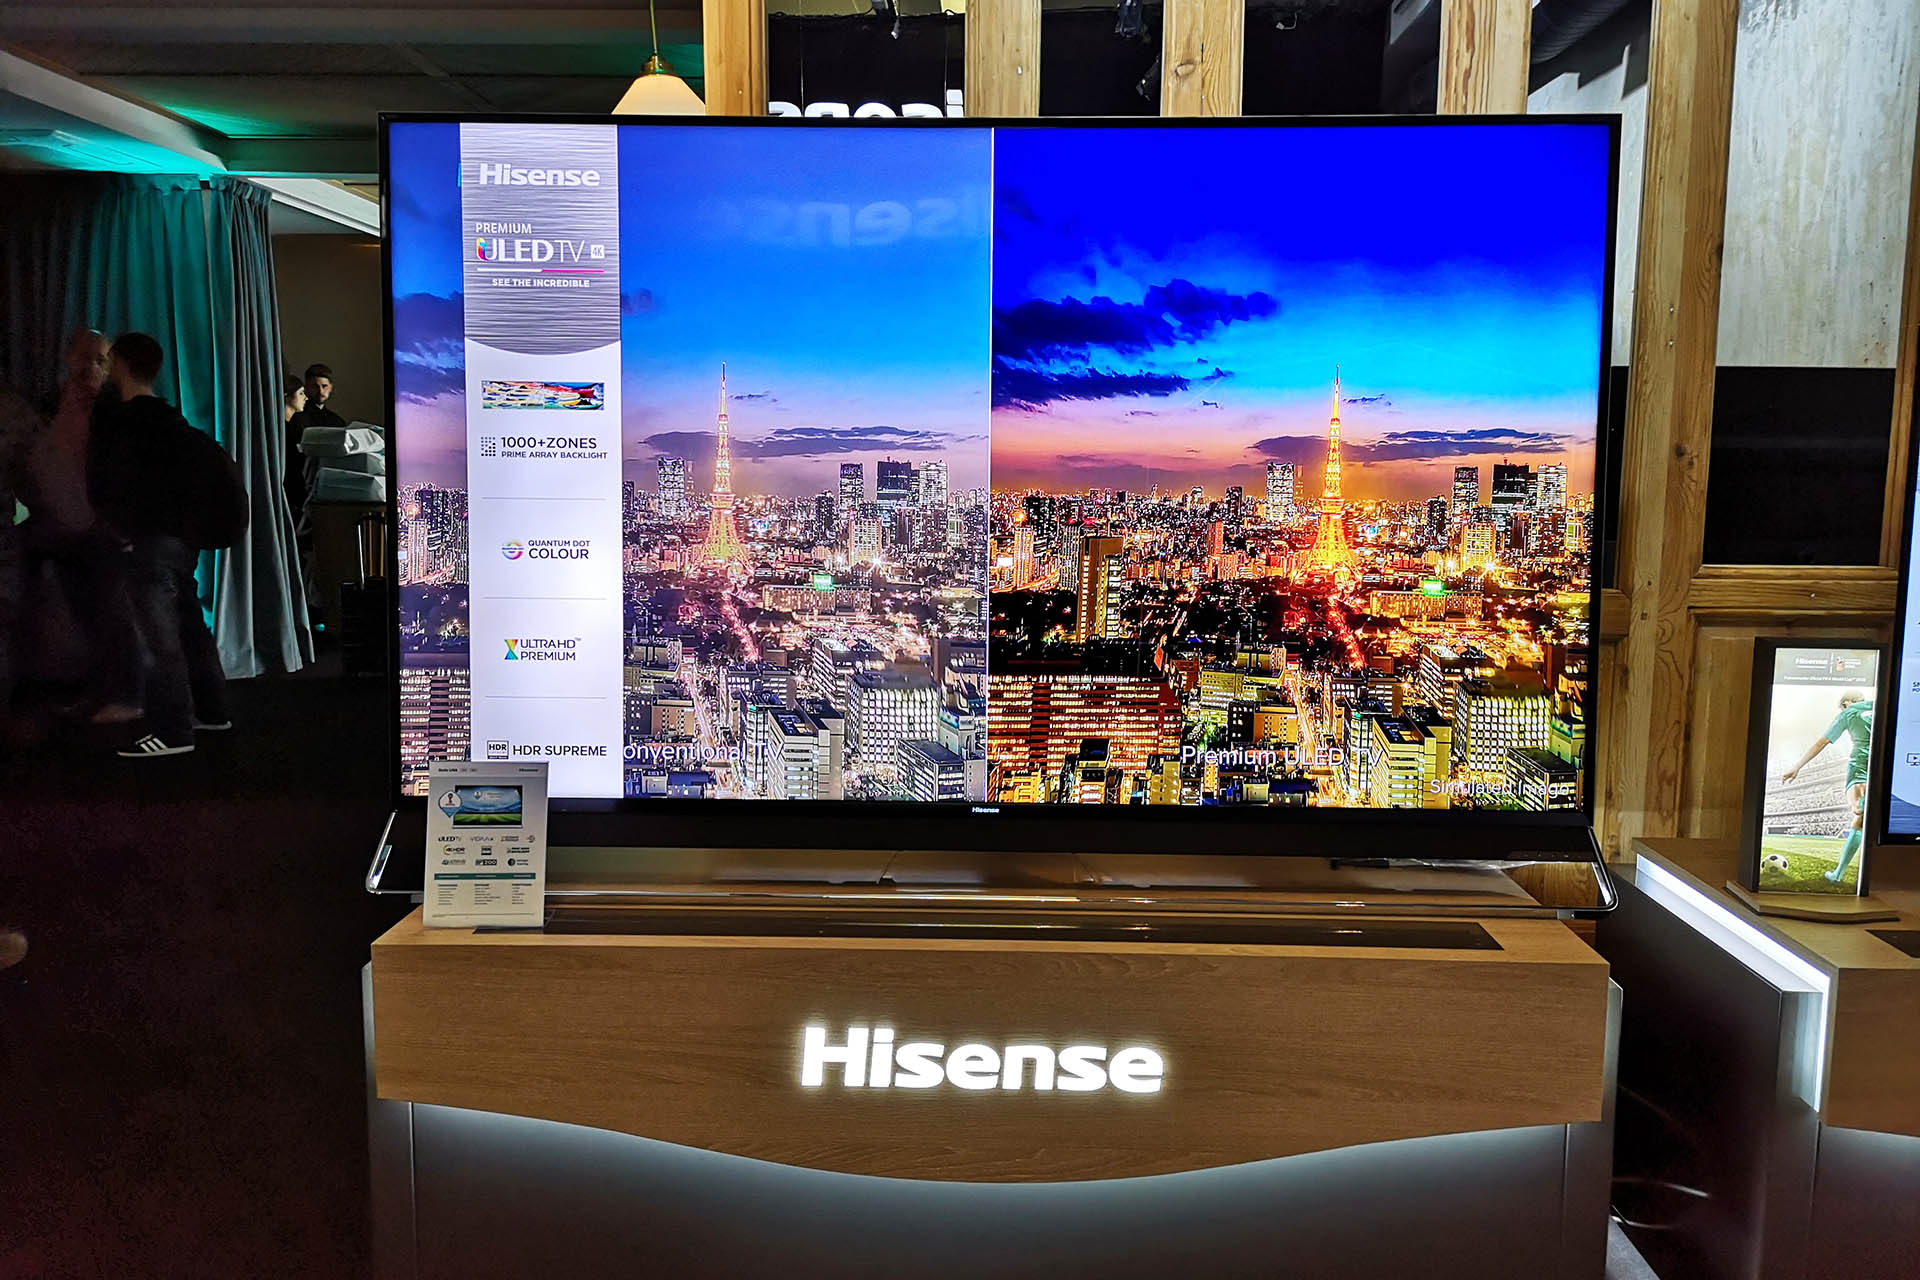 hisense lança laser tv de 100 polegadas - Hisense Laser TV 04 - Hisense lança Laser TV de 100 polegadas